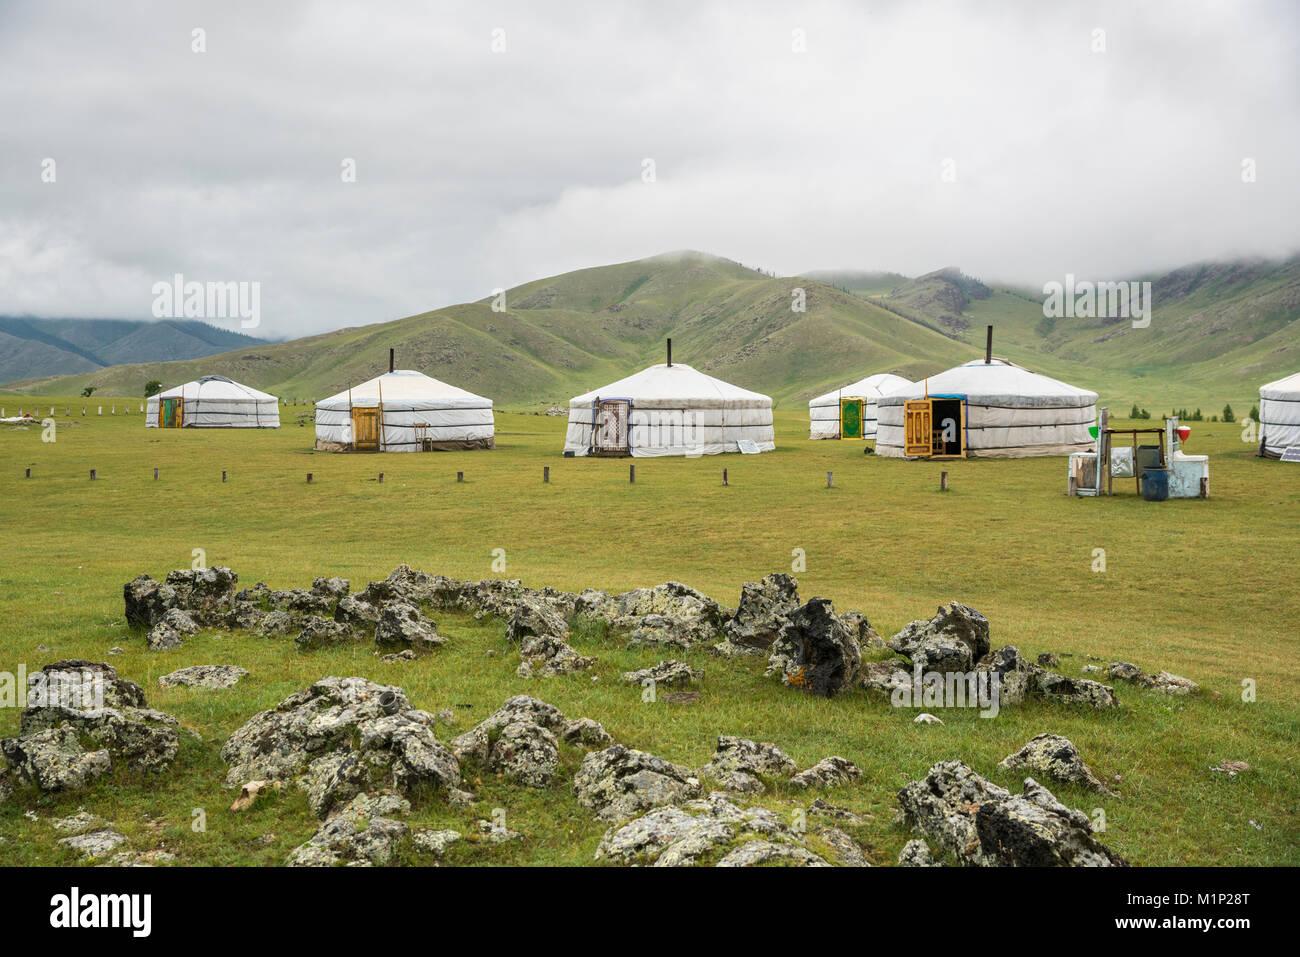 Nomadische Familie Ger camp, Orkhon Tal, im Süden der Provinz Hangay, Mongolei, Zentralasien, Asien Stockbild